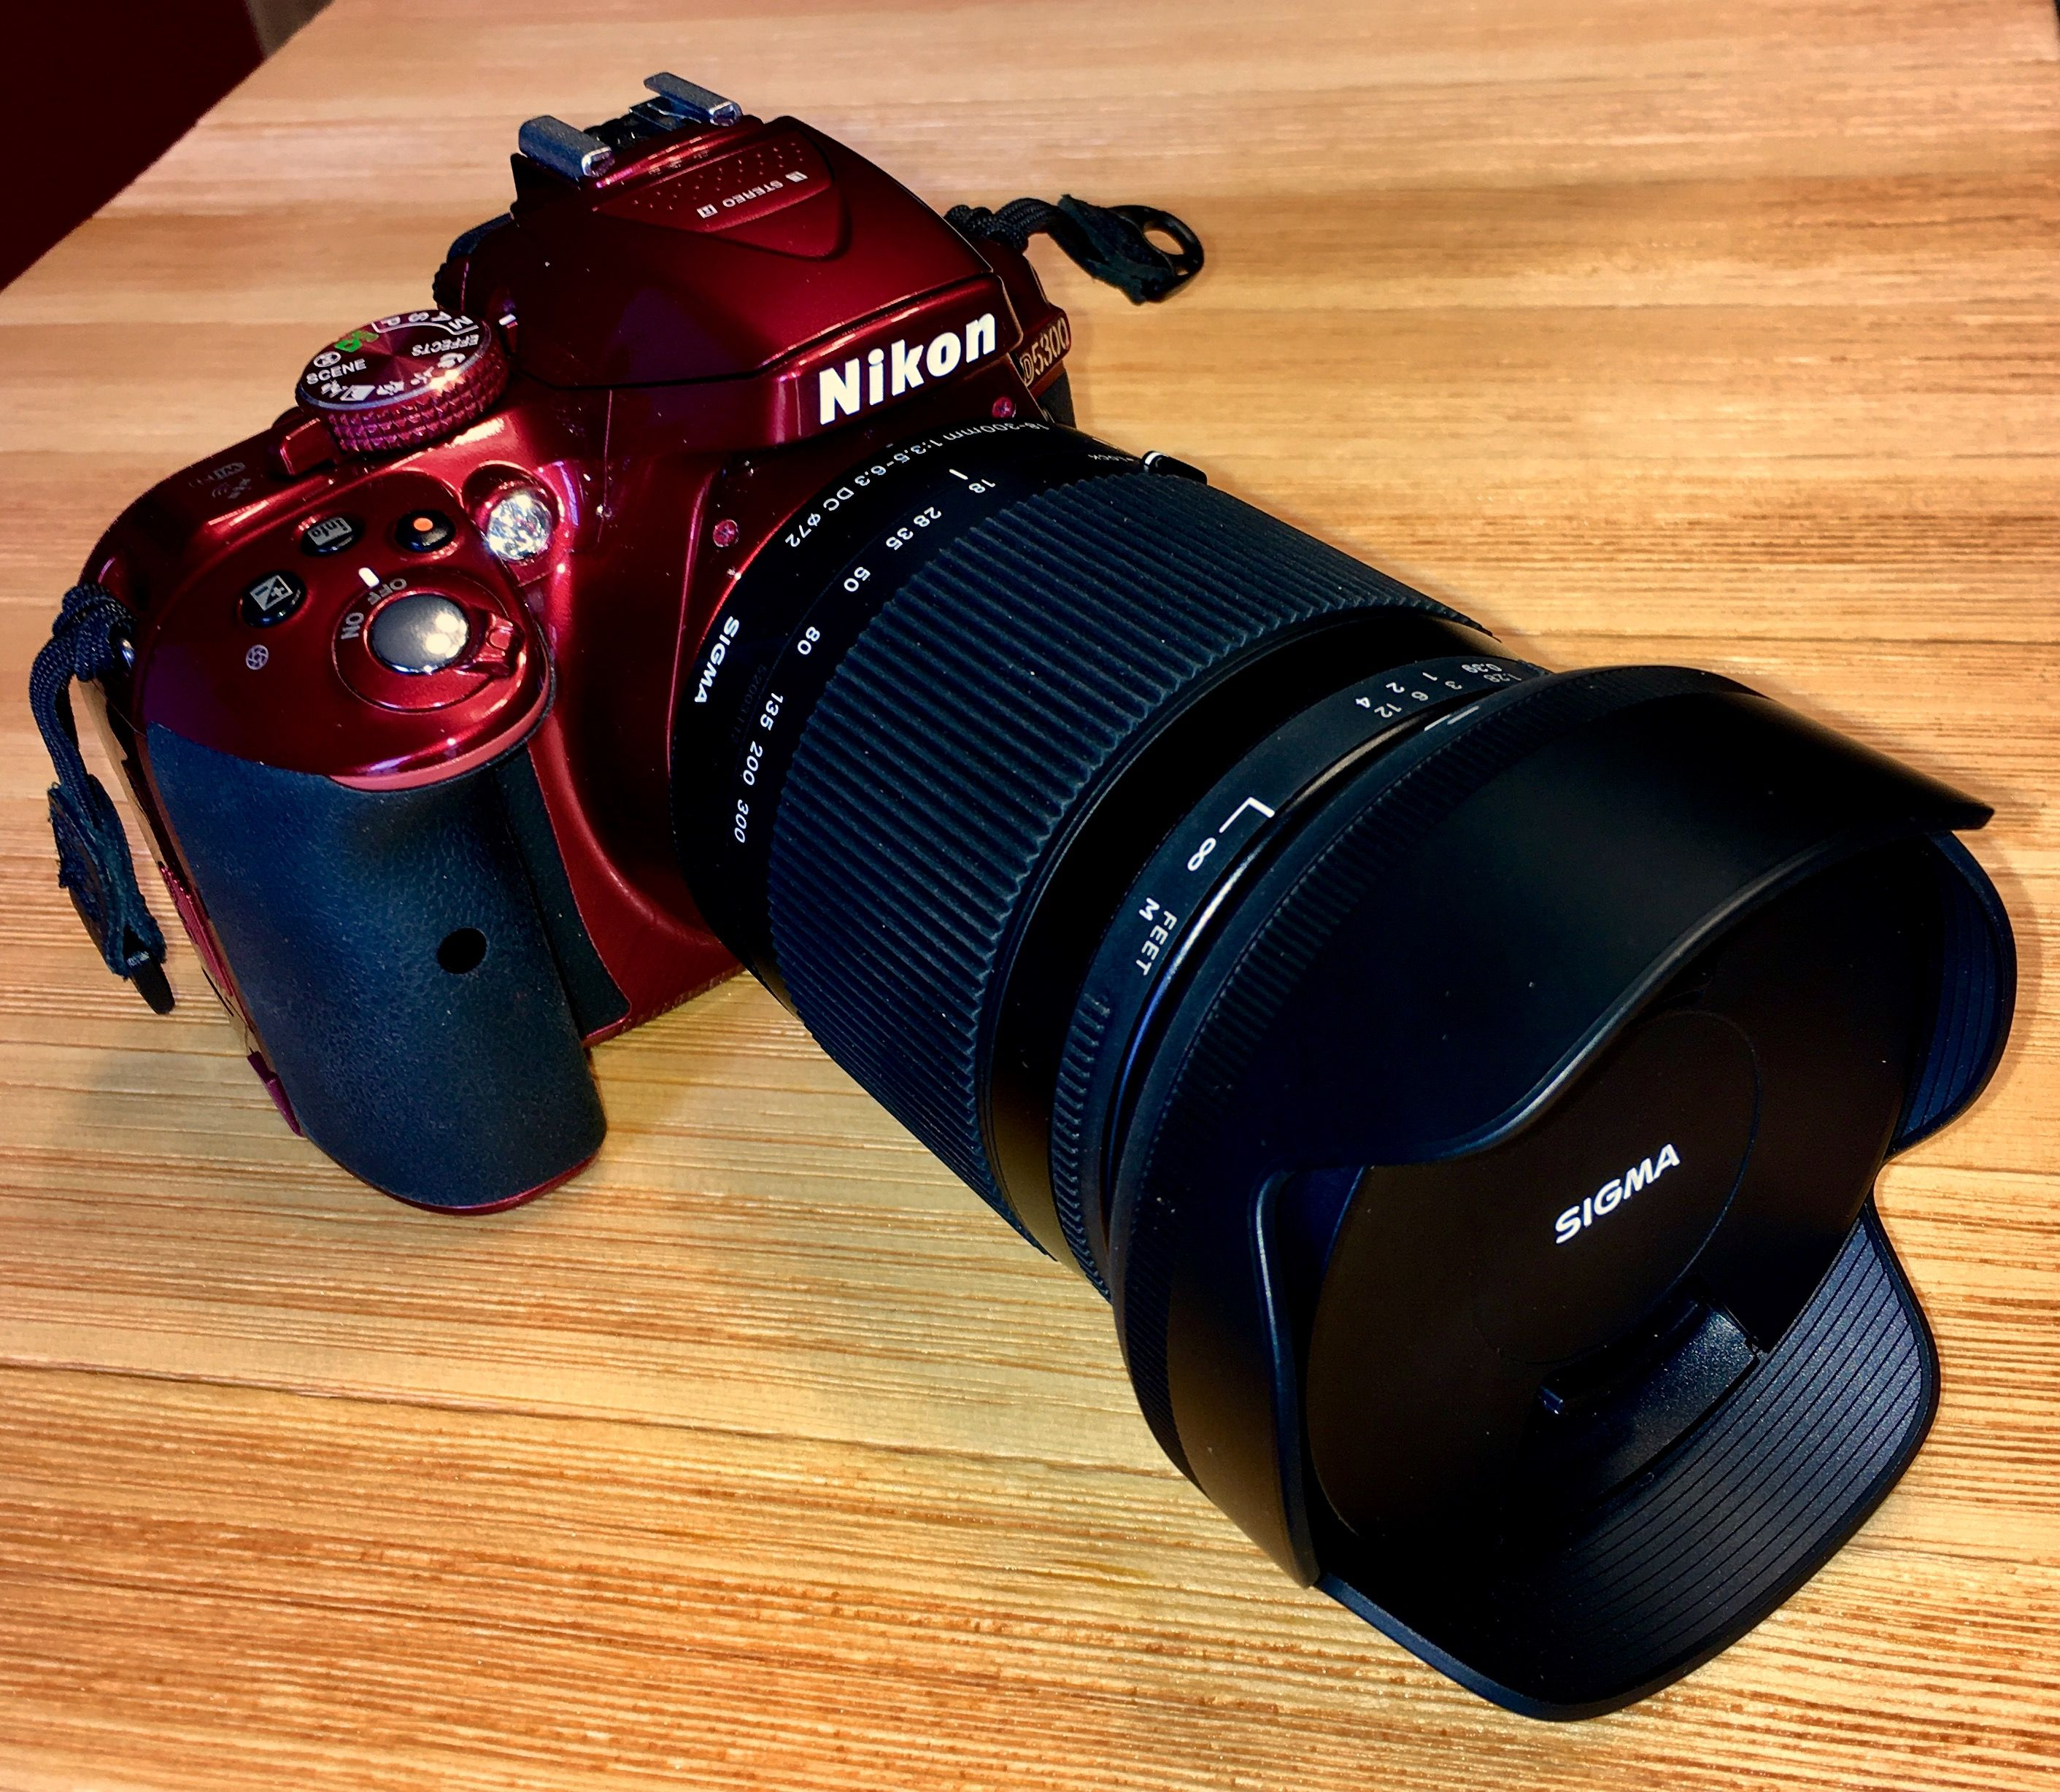 Nikon D5300 And Sigma 18 300mm F 3 5 6 3 Dc Macro Os Hsm Contemporary Lens 67mm Nikon D5300 Nikon Lens